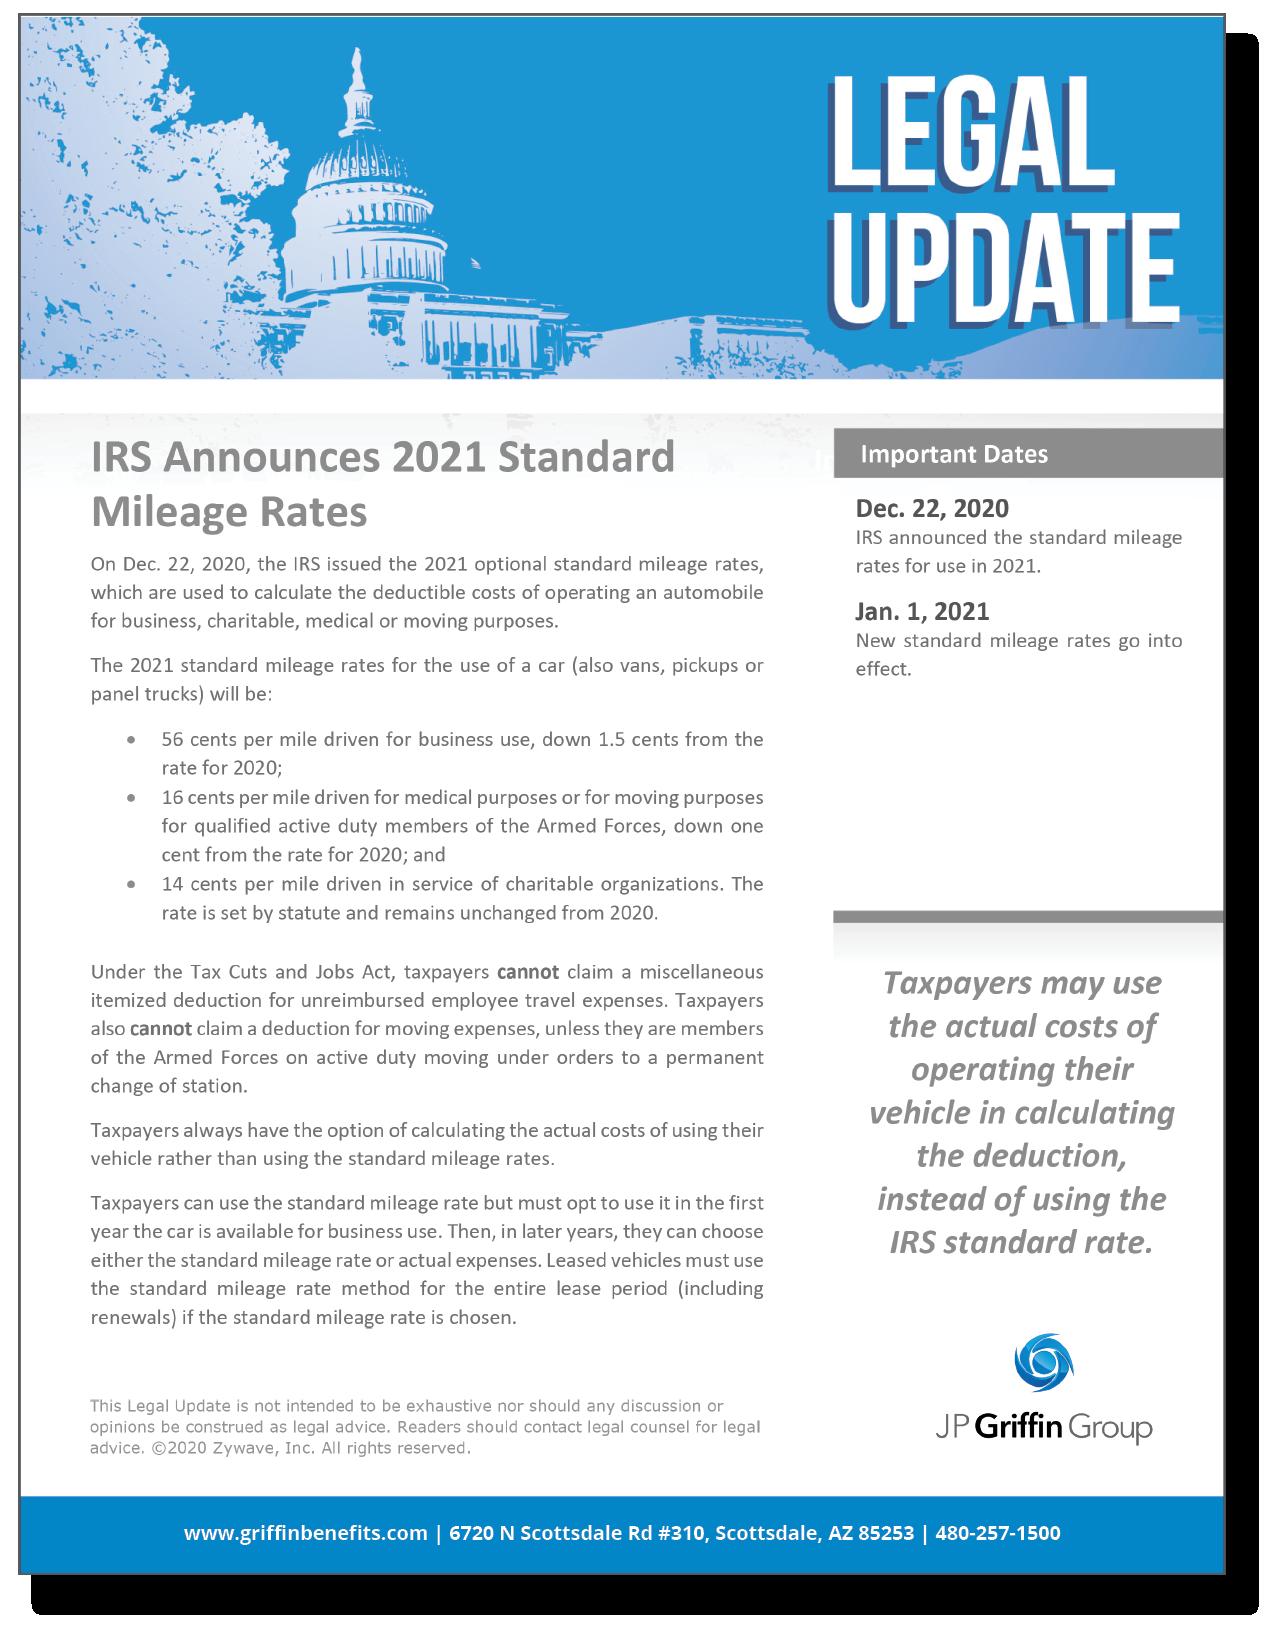 IRS Announces 2021 Standard Mileage Rates